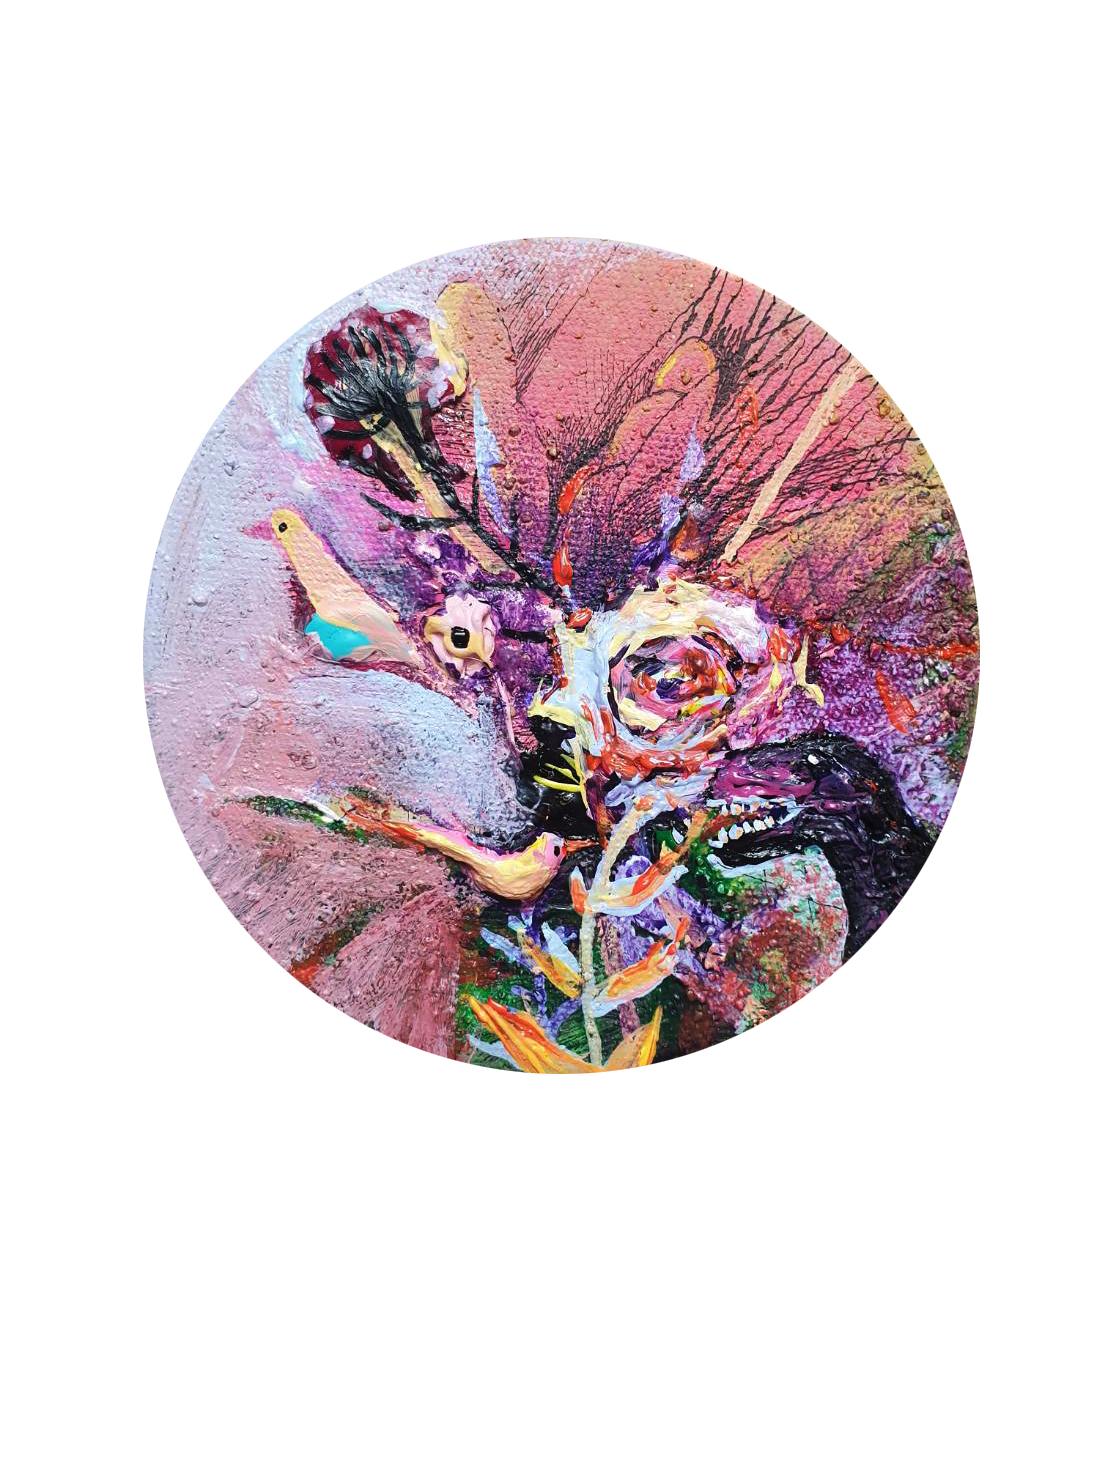 38.本質 Acrylic on canvas 15x15cm 2020